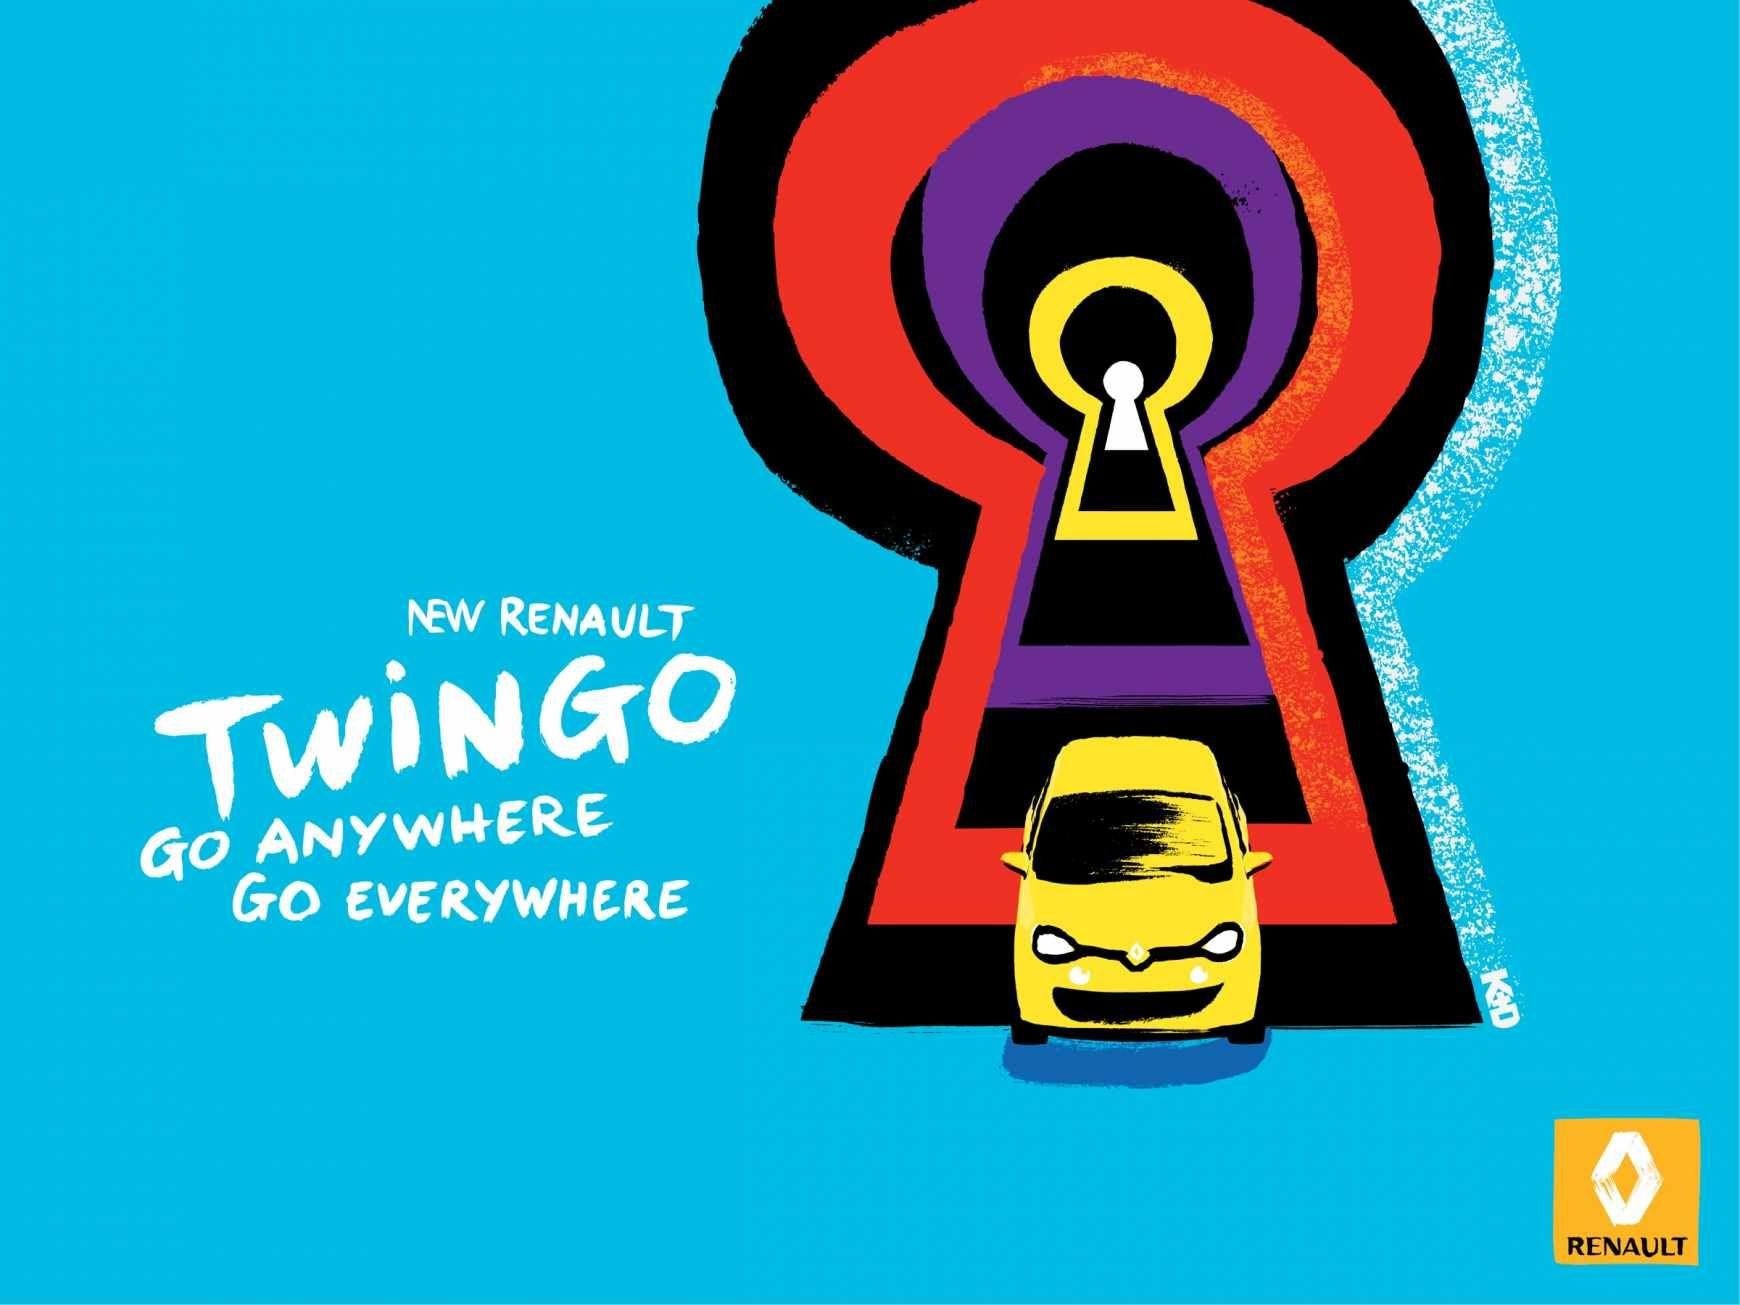 Renault Twingo Go Anywhere Go Everywhere 11 Publicites